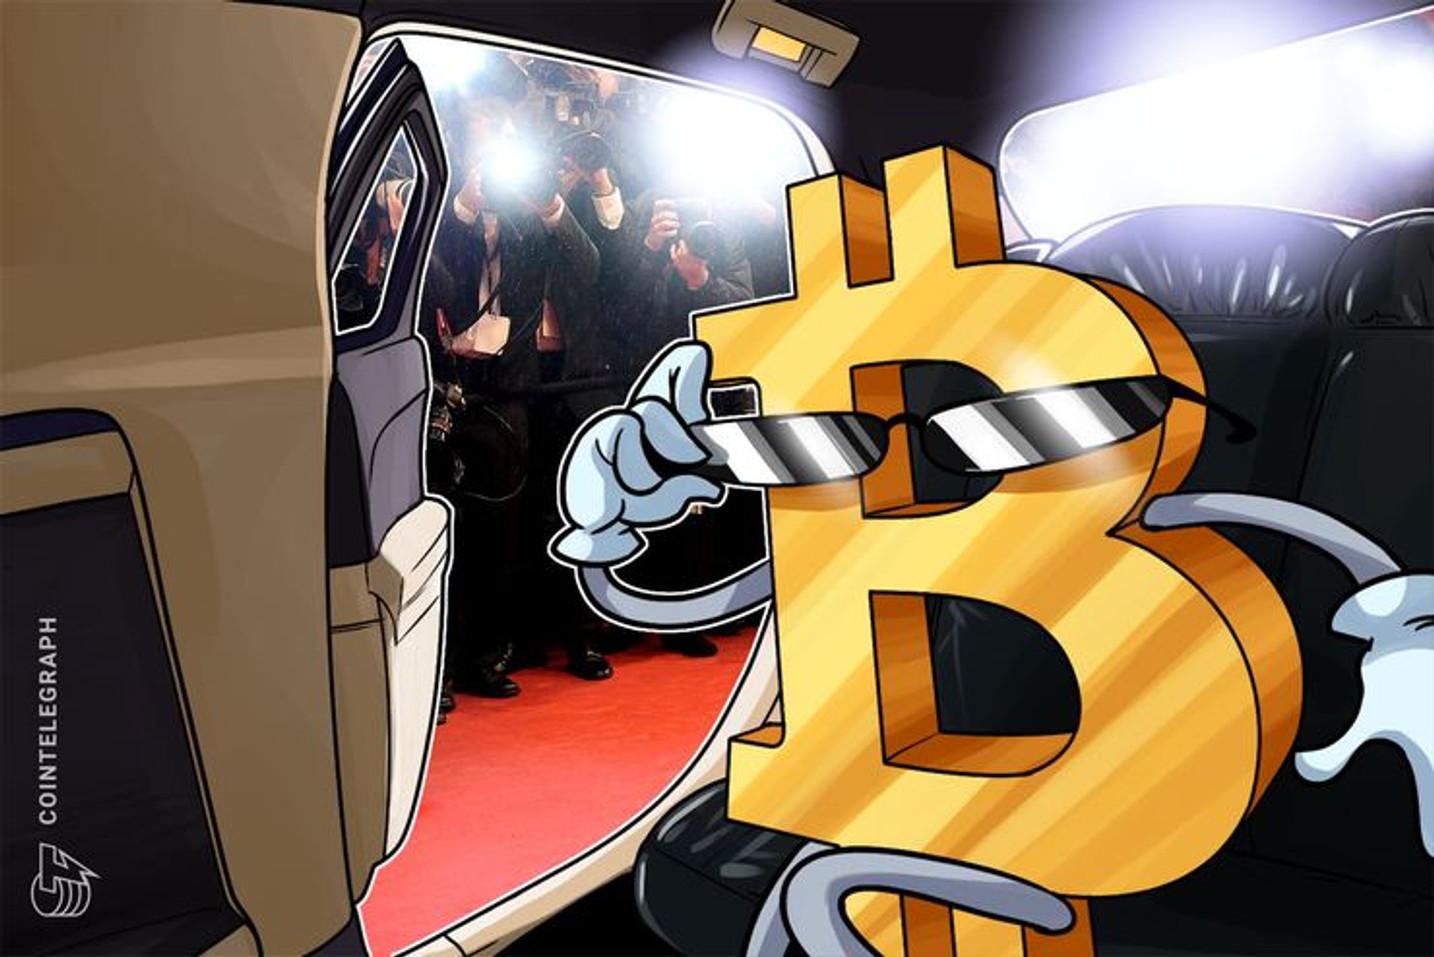 Número de usuários de Bitcoin nos EUA ultrapassa suprimento total da criptomoeda no mundo